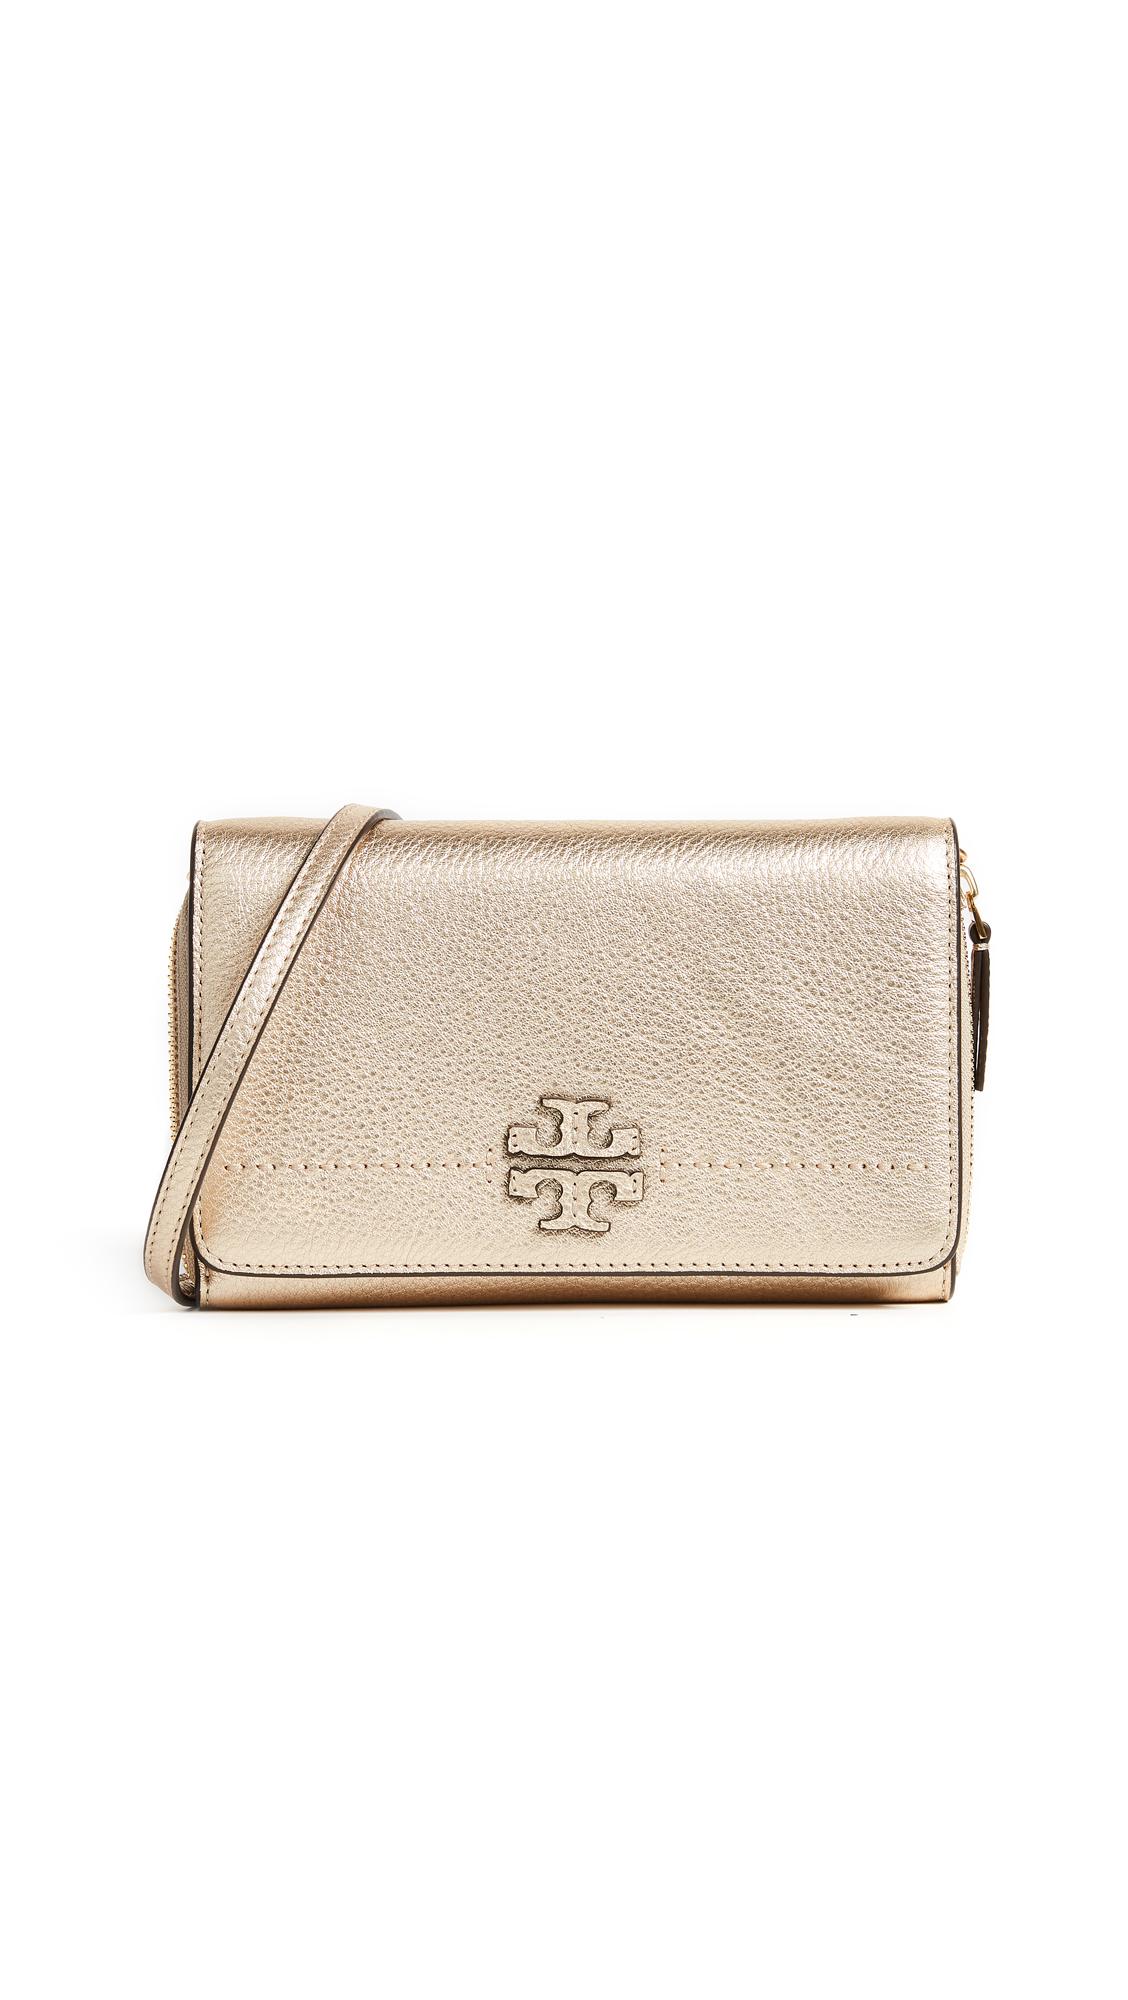 Tory Burch McGraw Flat Cross Body Bag - Gold